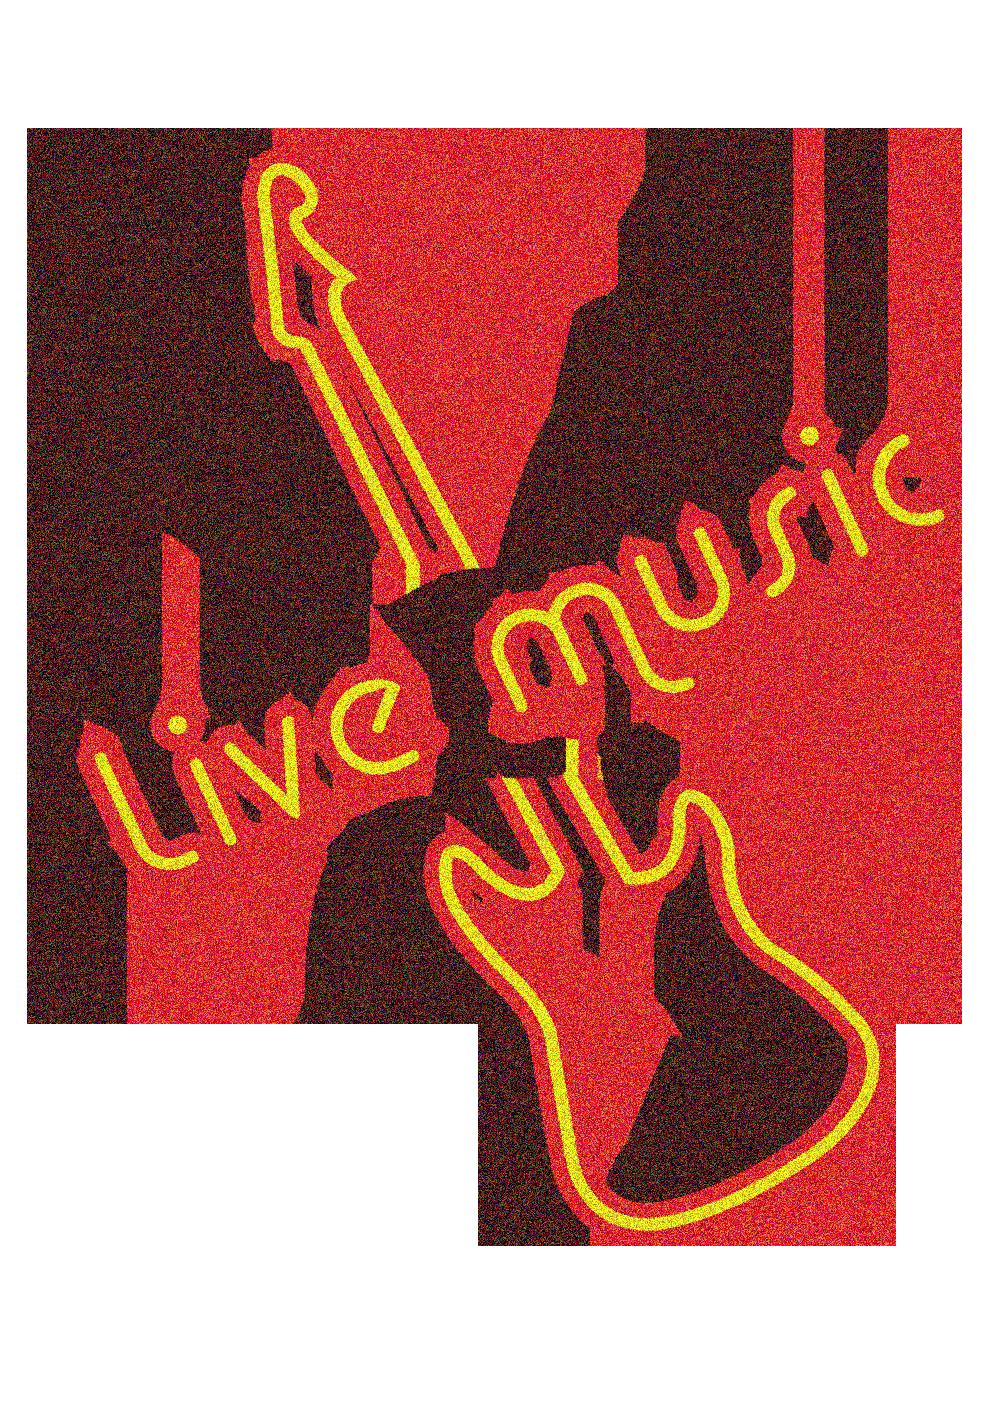 Live Music Png Hdpng.com 1000 - Live Music, Transparent background PNG HD thumbnail